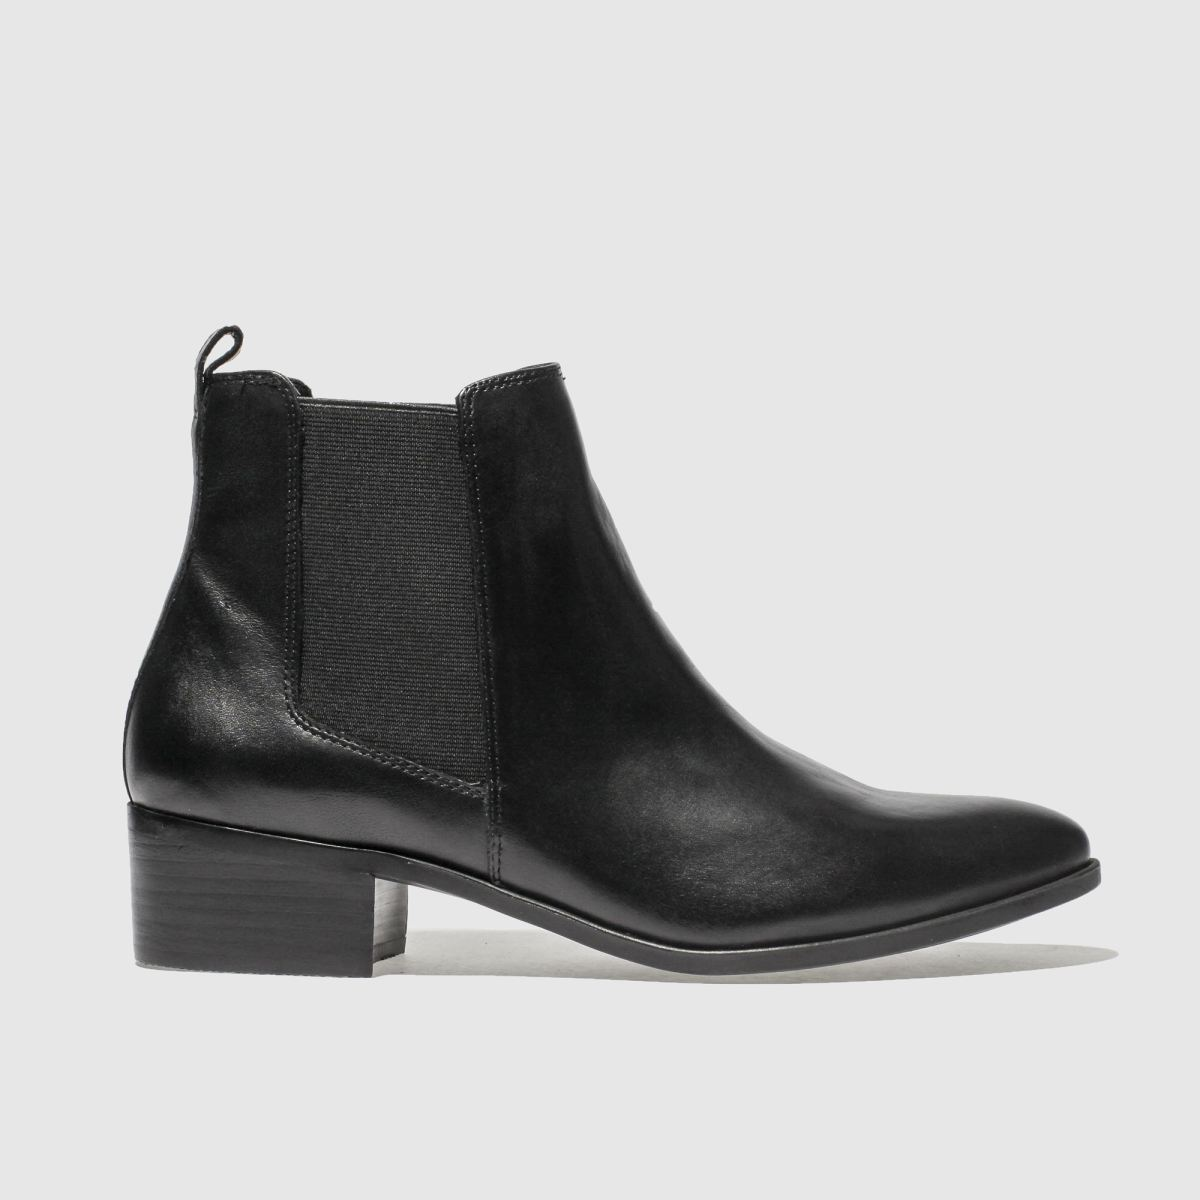 Schuh Black Chillax Boots